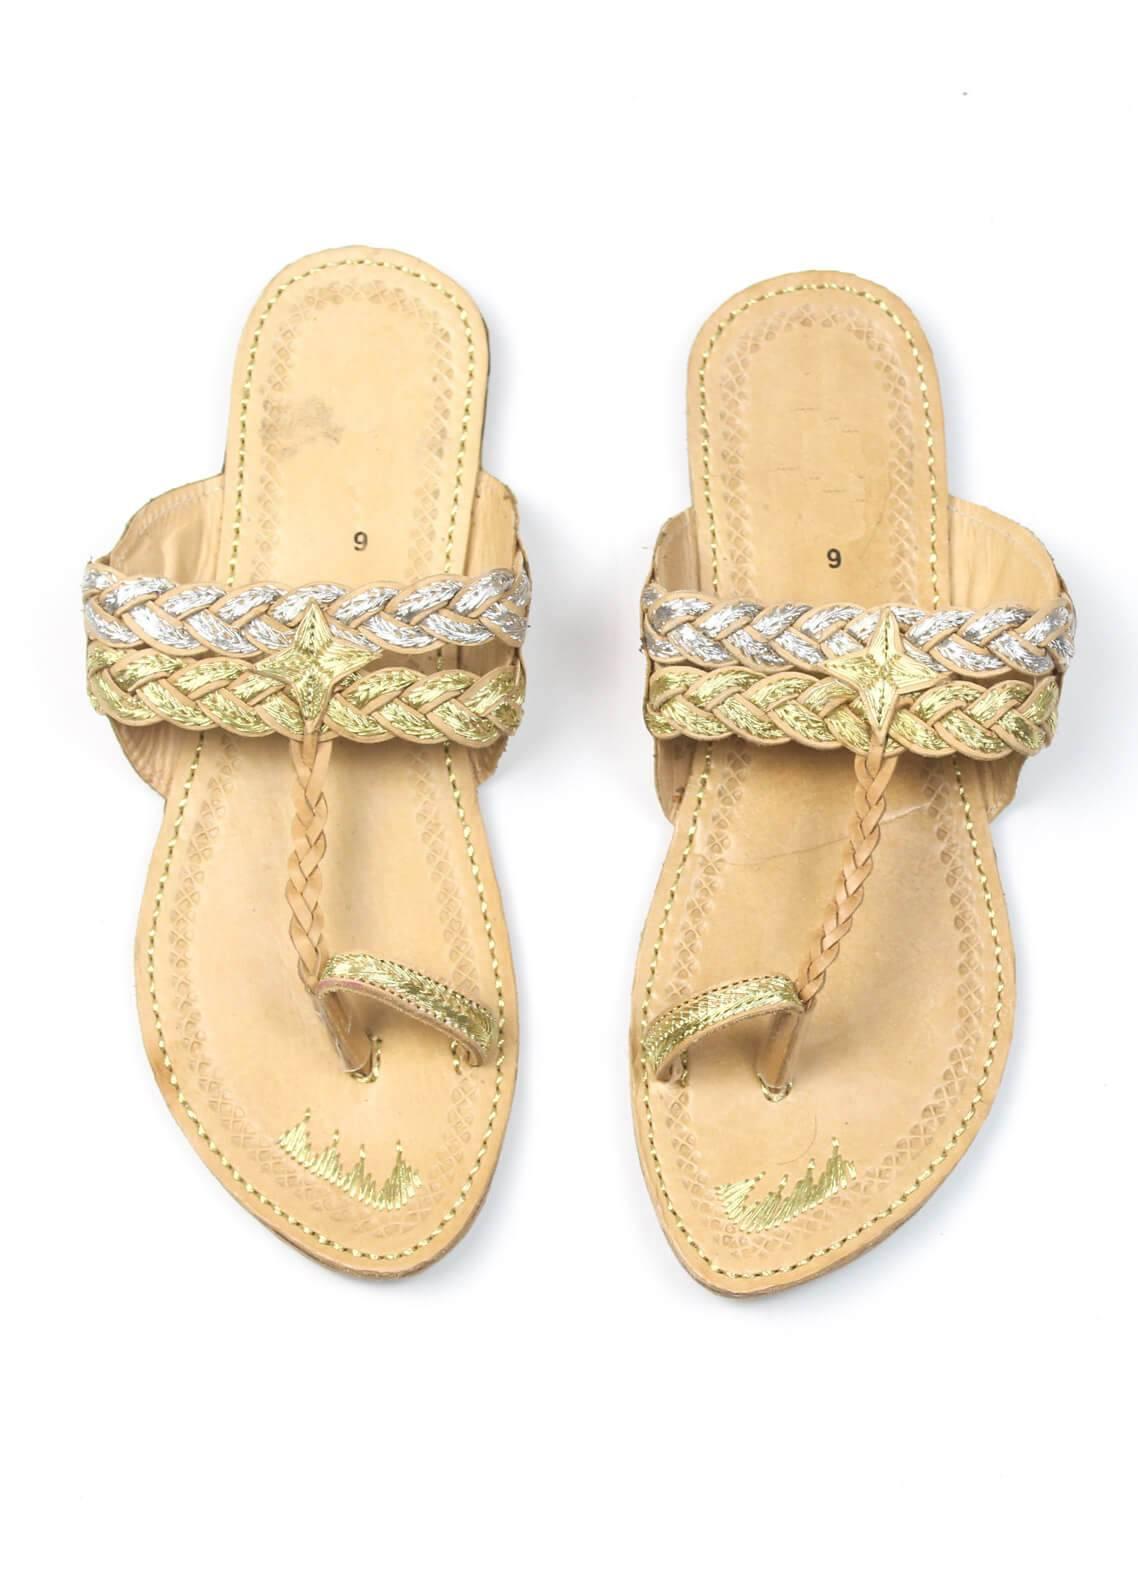 Silk Avenue Kolapuri Style Leather Flat Shoes SAF08-Classic